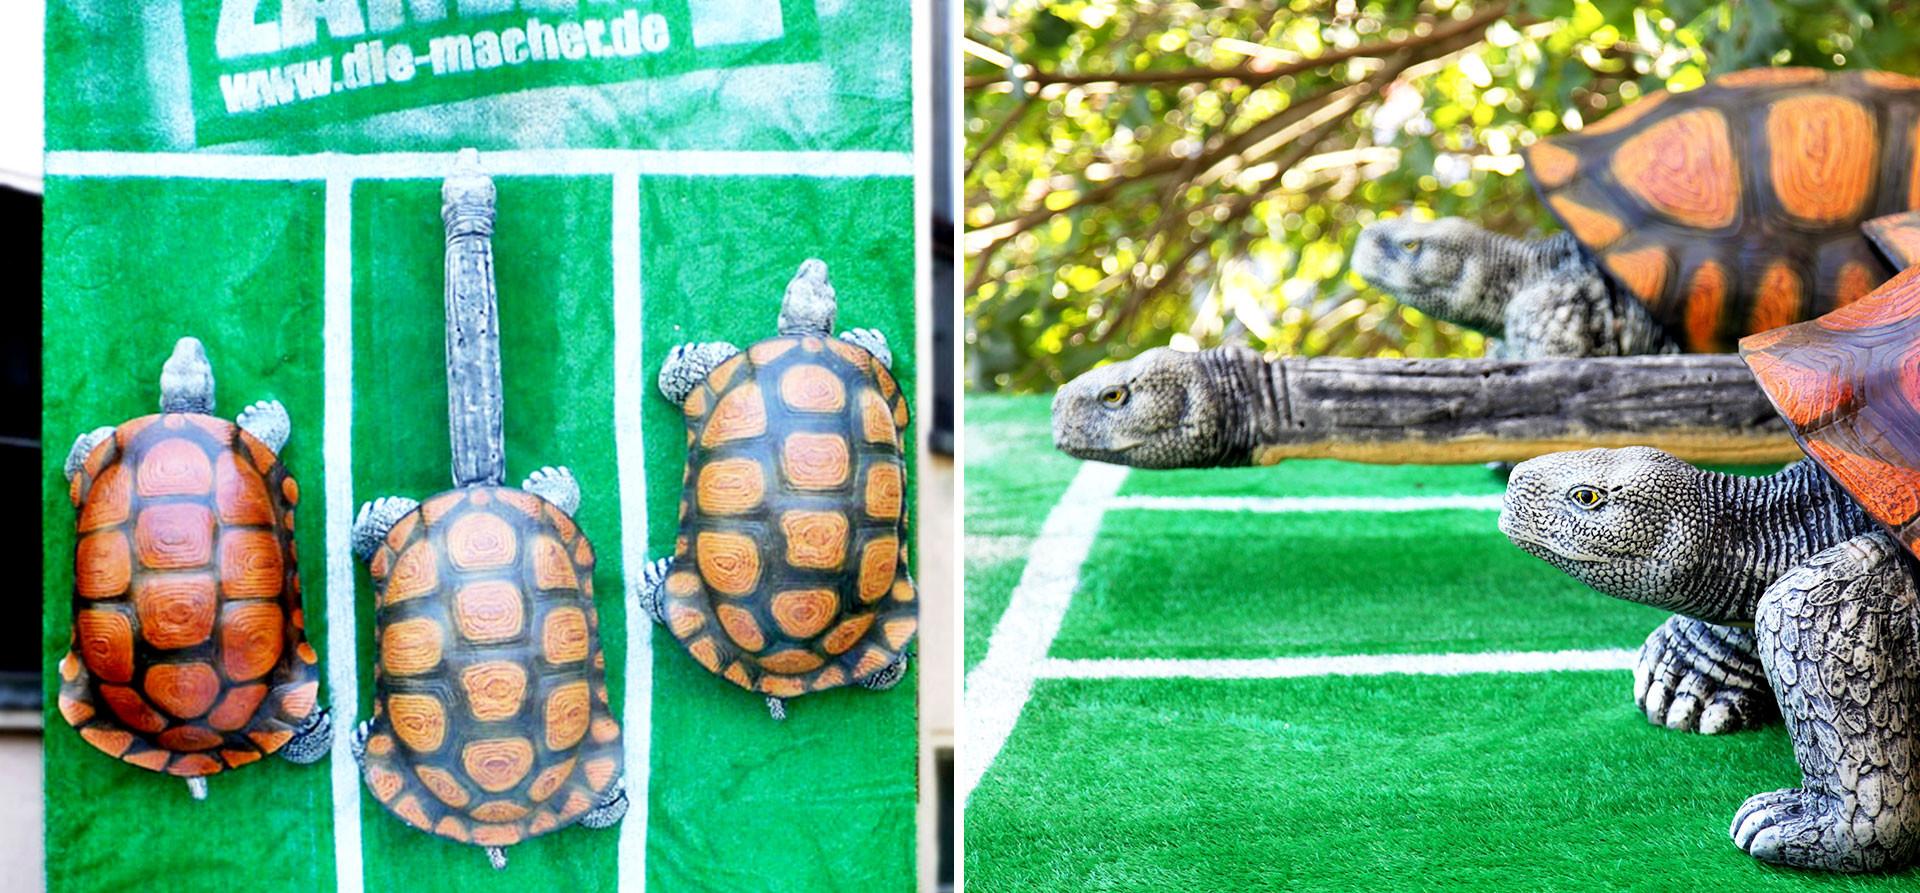 Schildkröten Großplastik